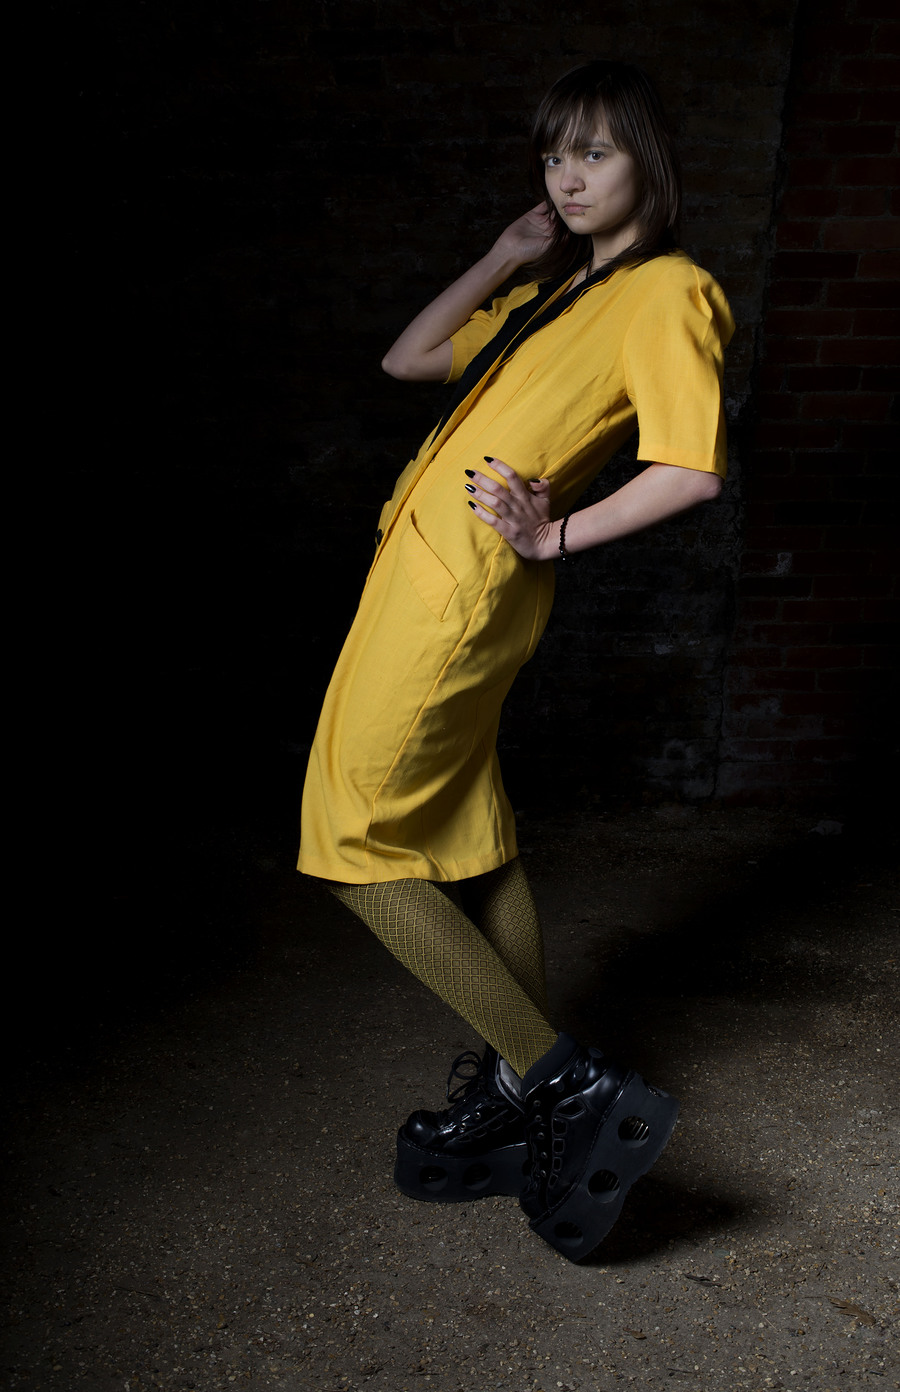 Yellow / Photography by Scott at Evergreen, Model Olga Koles / Uploaded 29th January 2015 @ 10:36 PM